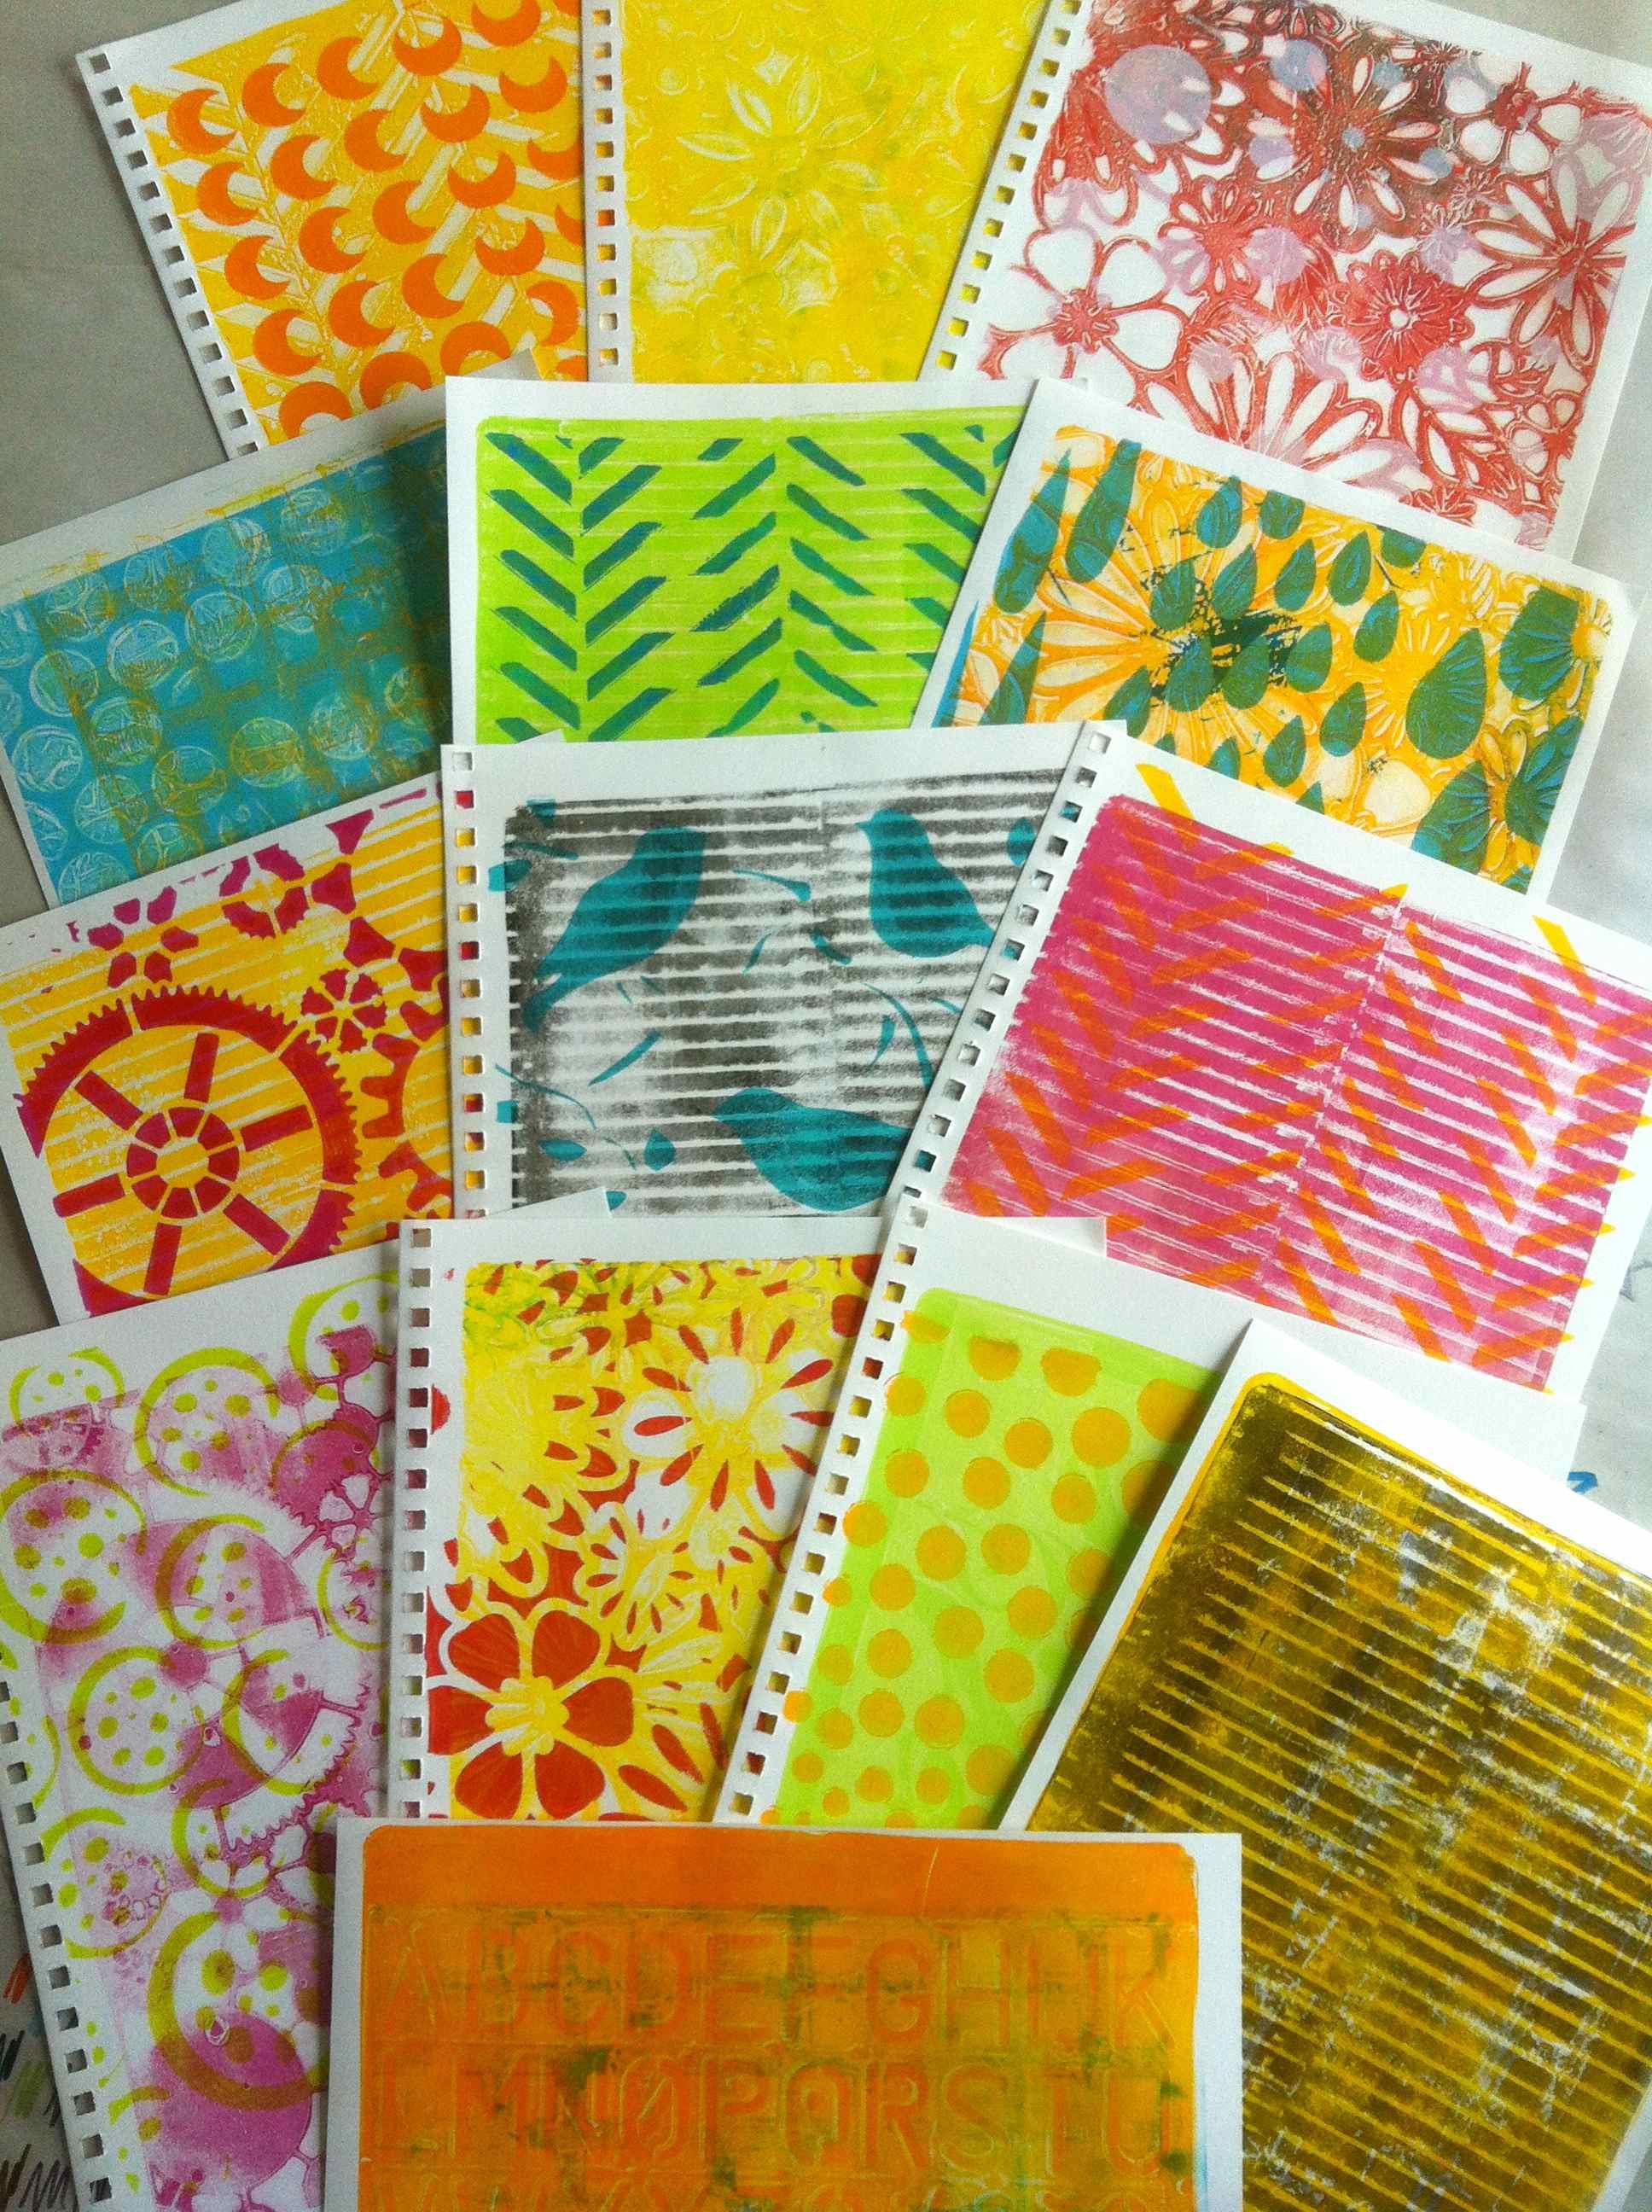 Gelli Arts Printing Plate – Part 2 | Simply Artistic Pleasures